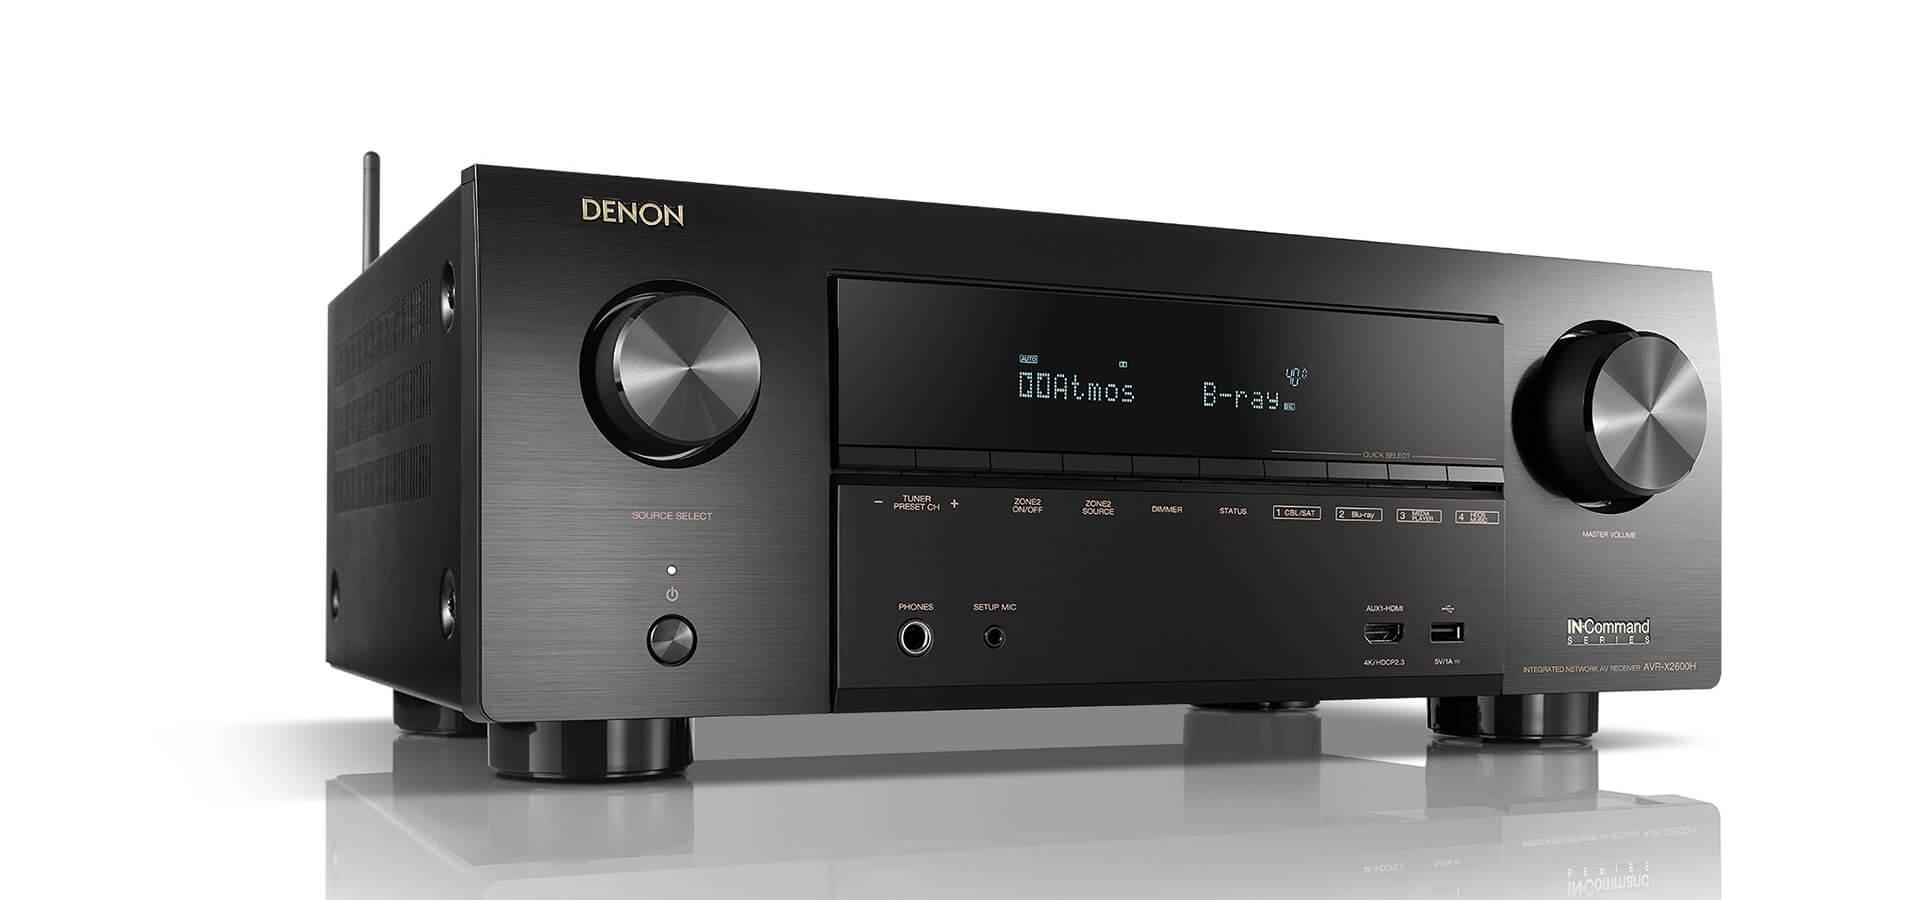 Denon AVR-X2600H Receiver